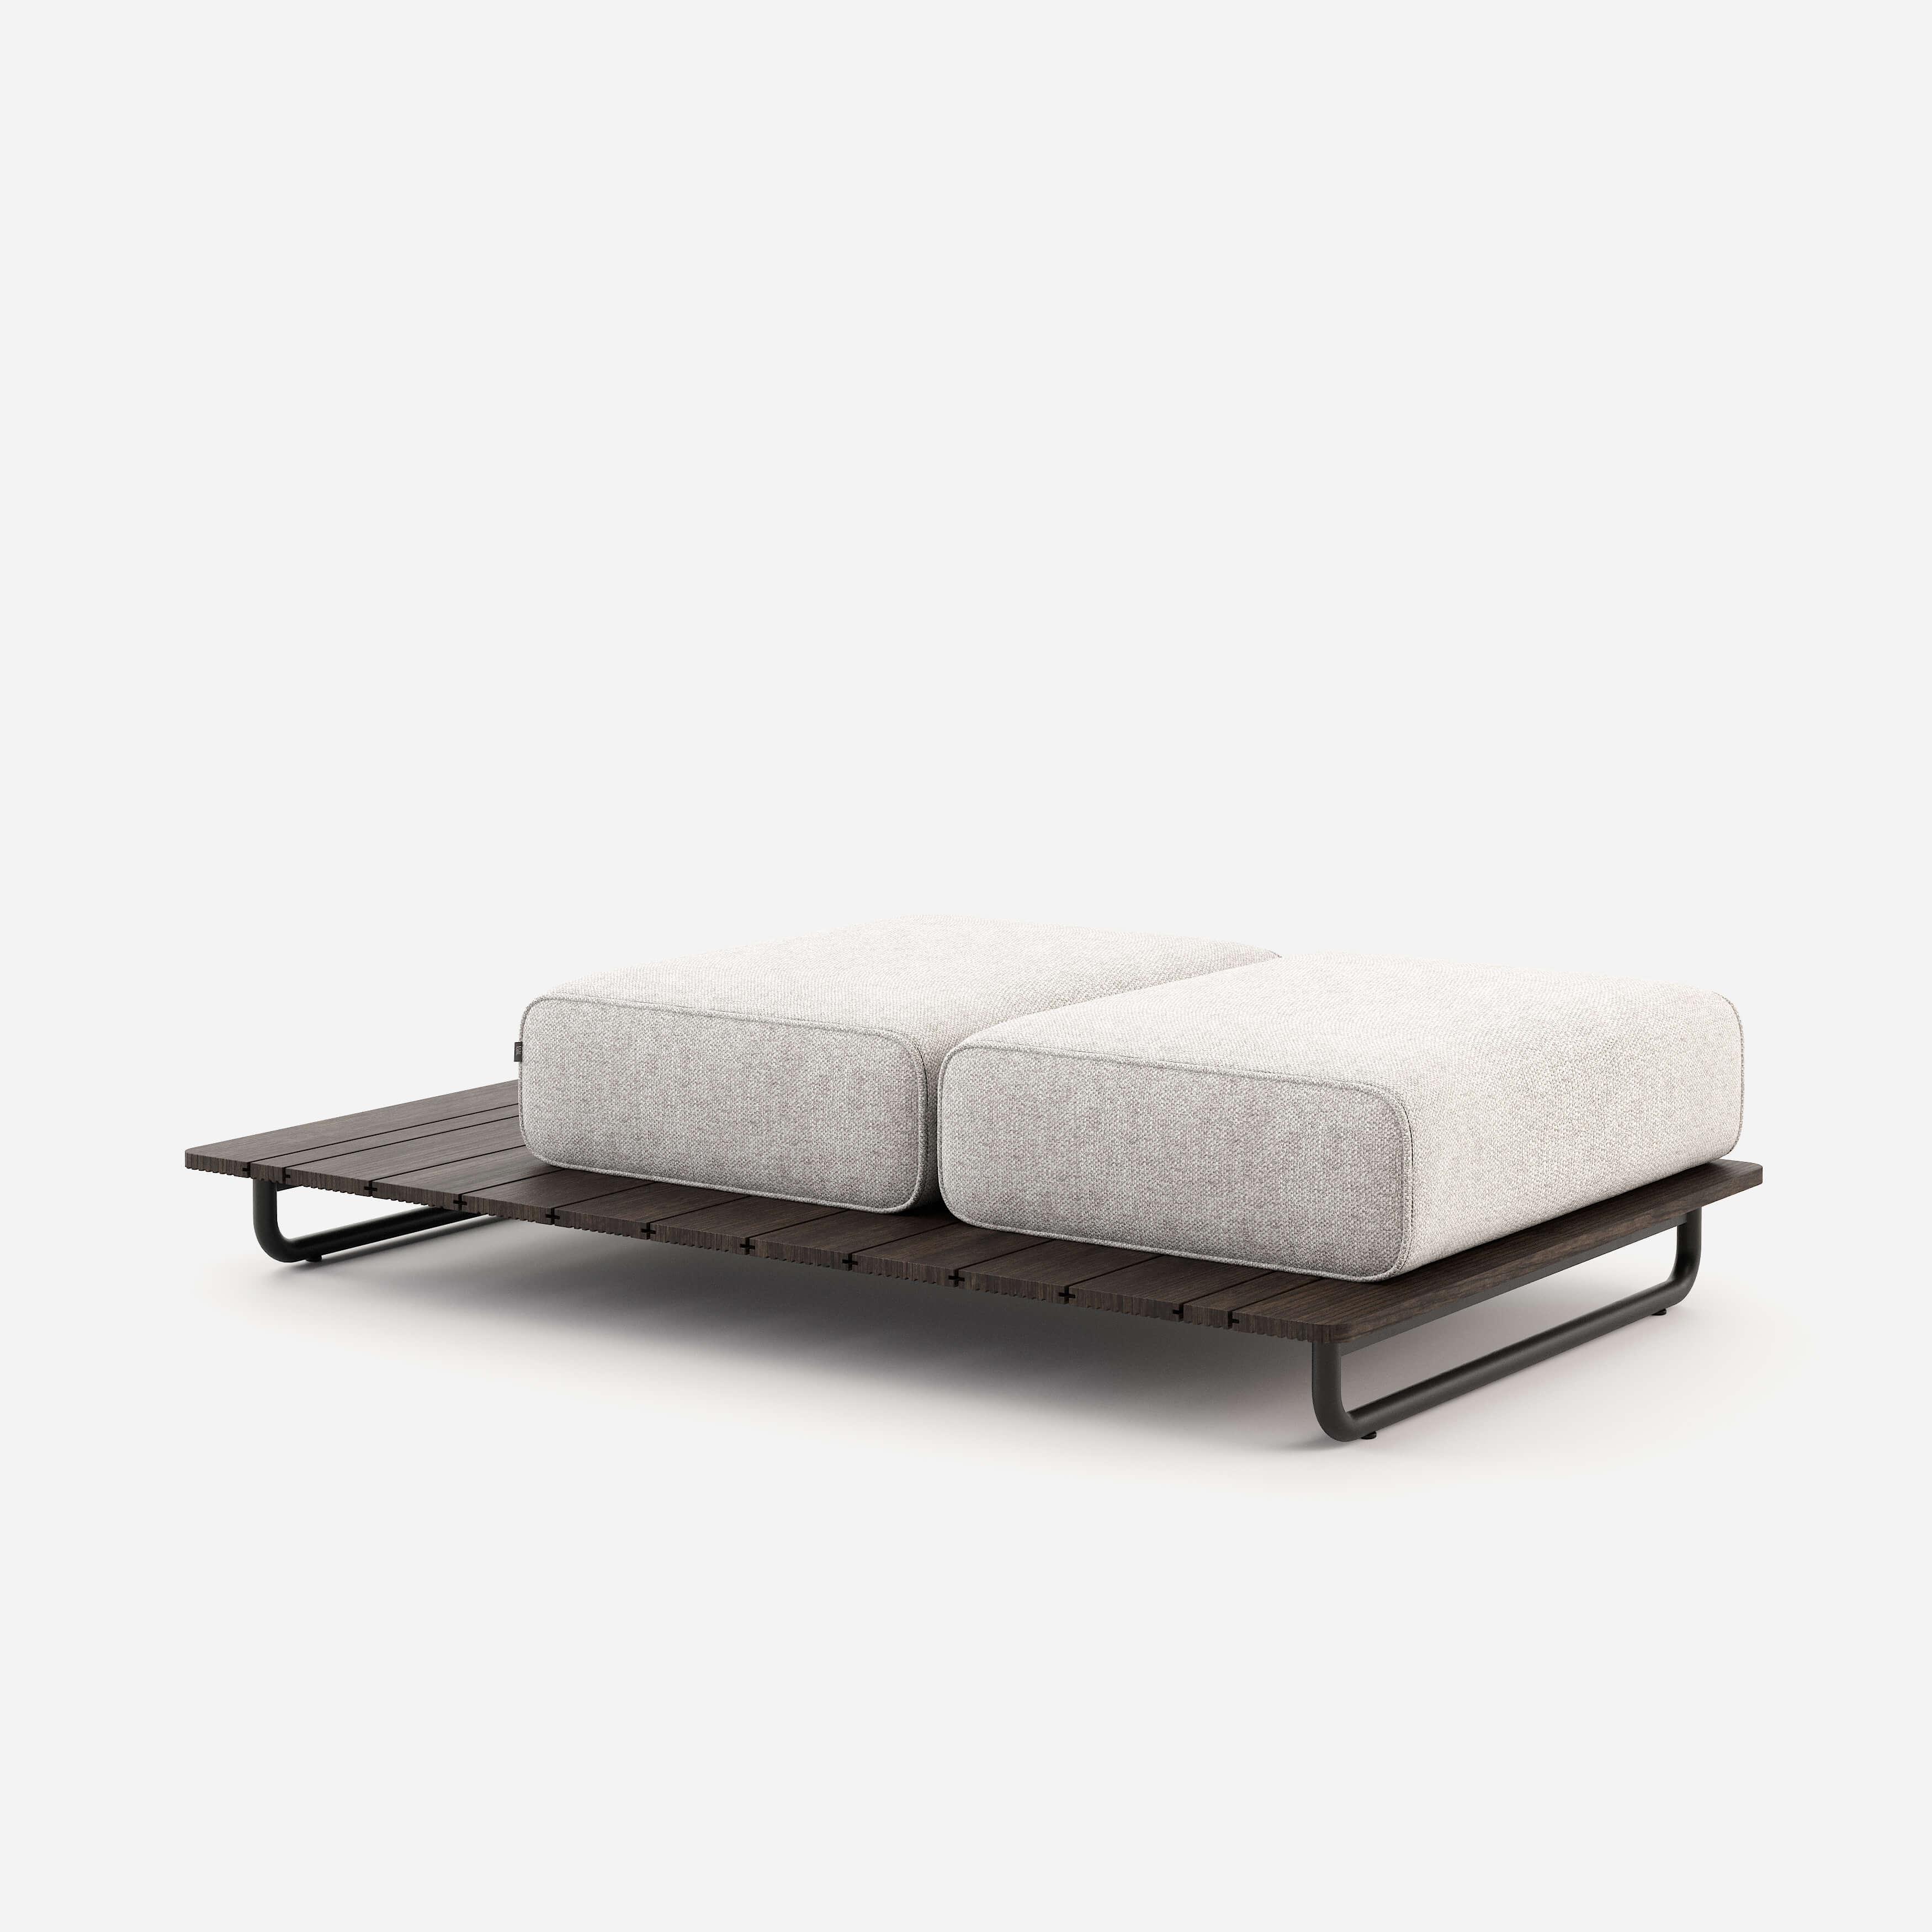 Pouf-copacabana-exterior-collection-domkapa-furniture-interior-design-upholstery-1